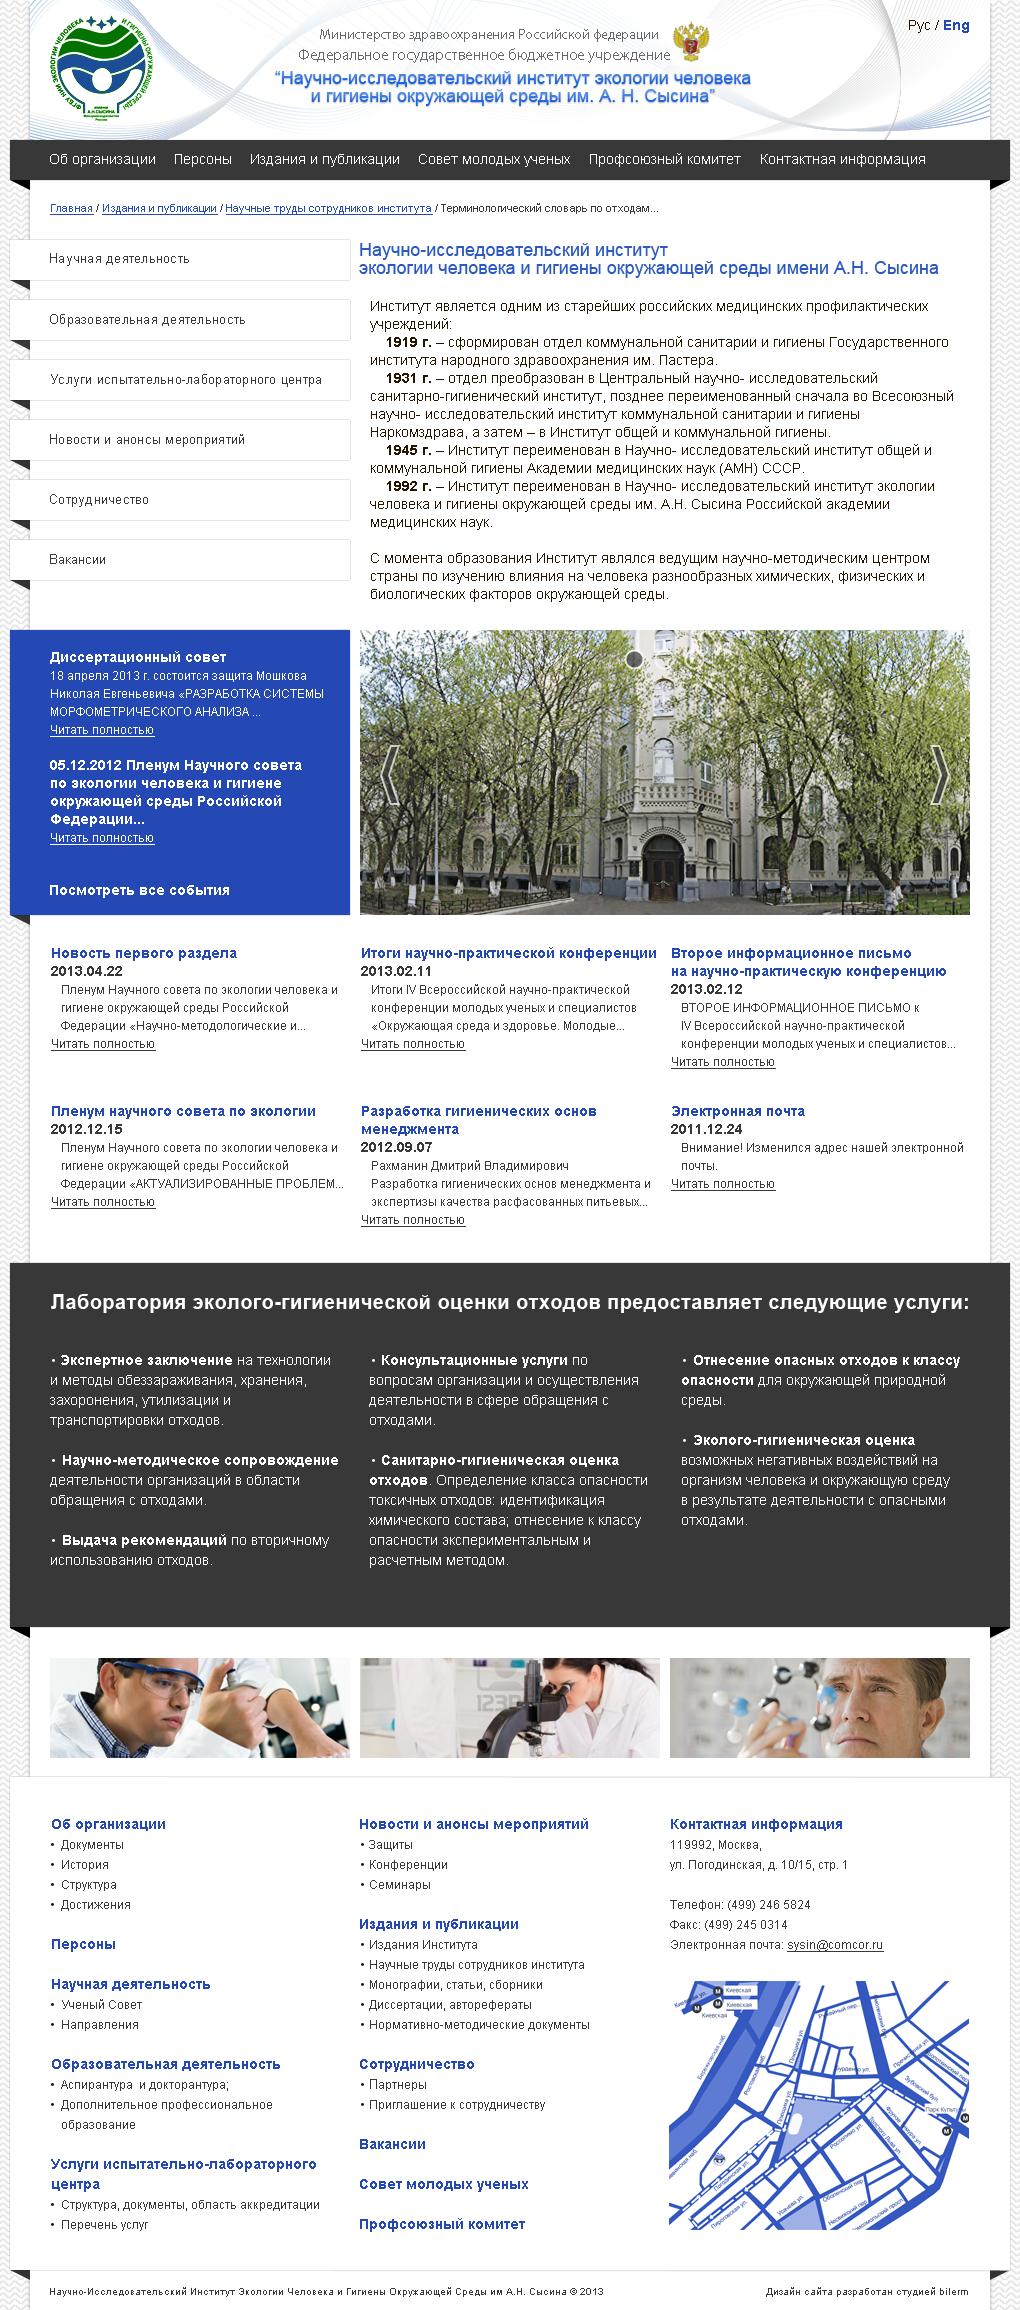 Редизайн сайта научно-исследовательского института фото f_869514b17f8534a0.png